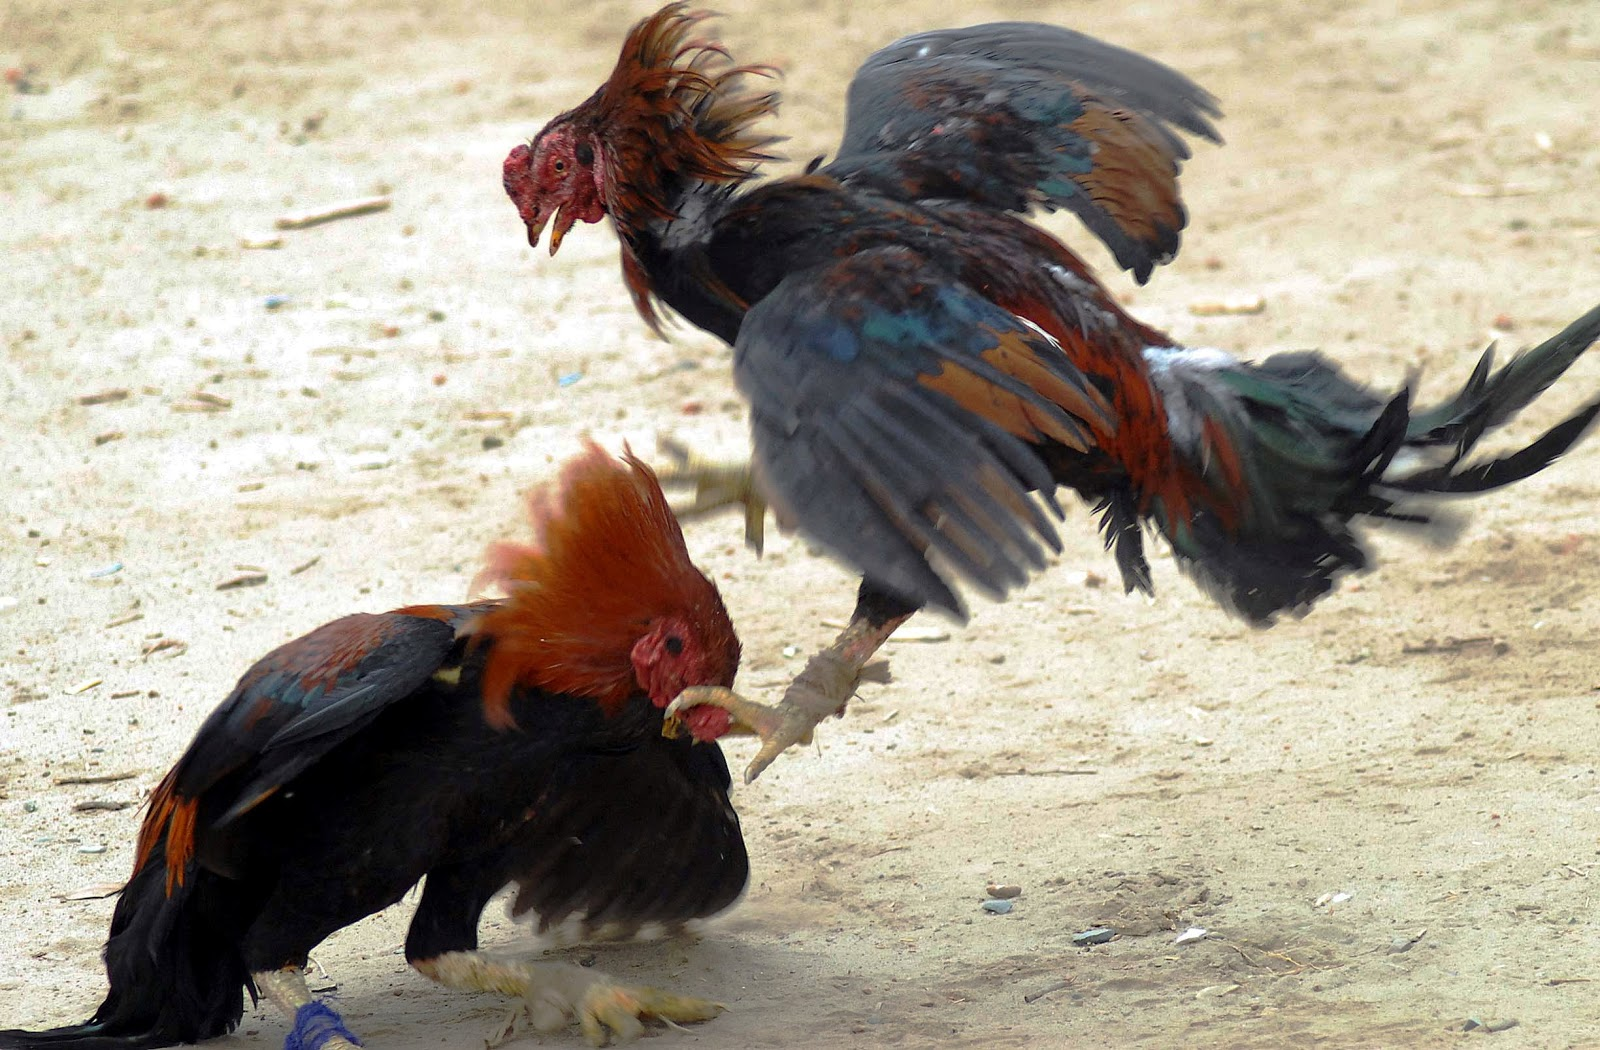 Paragwaj walki kogutów